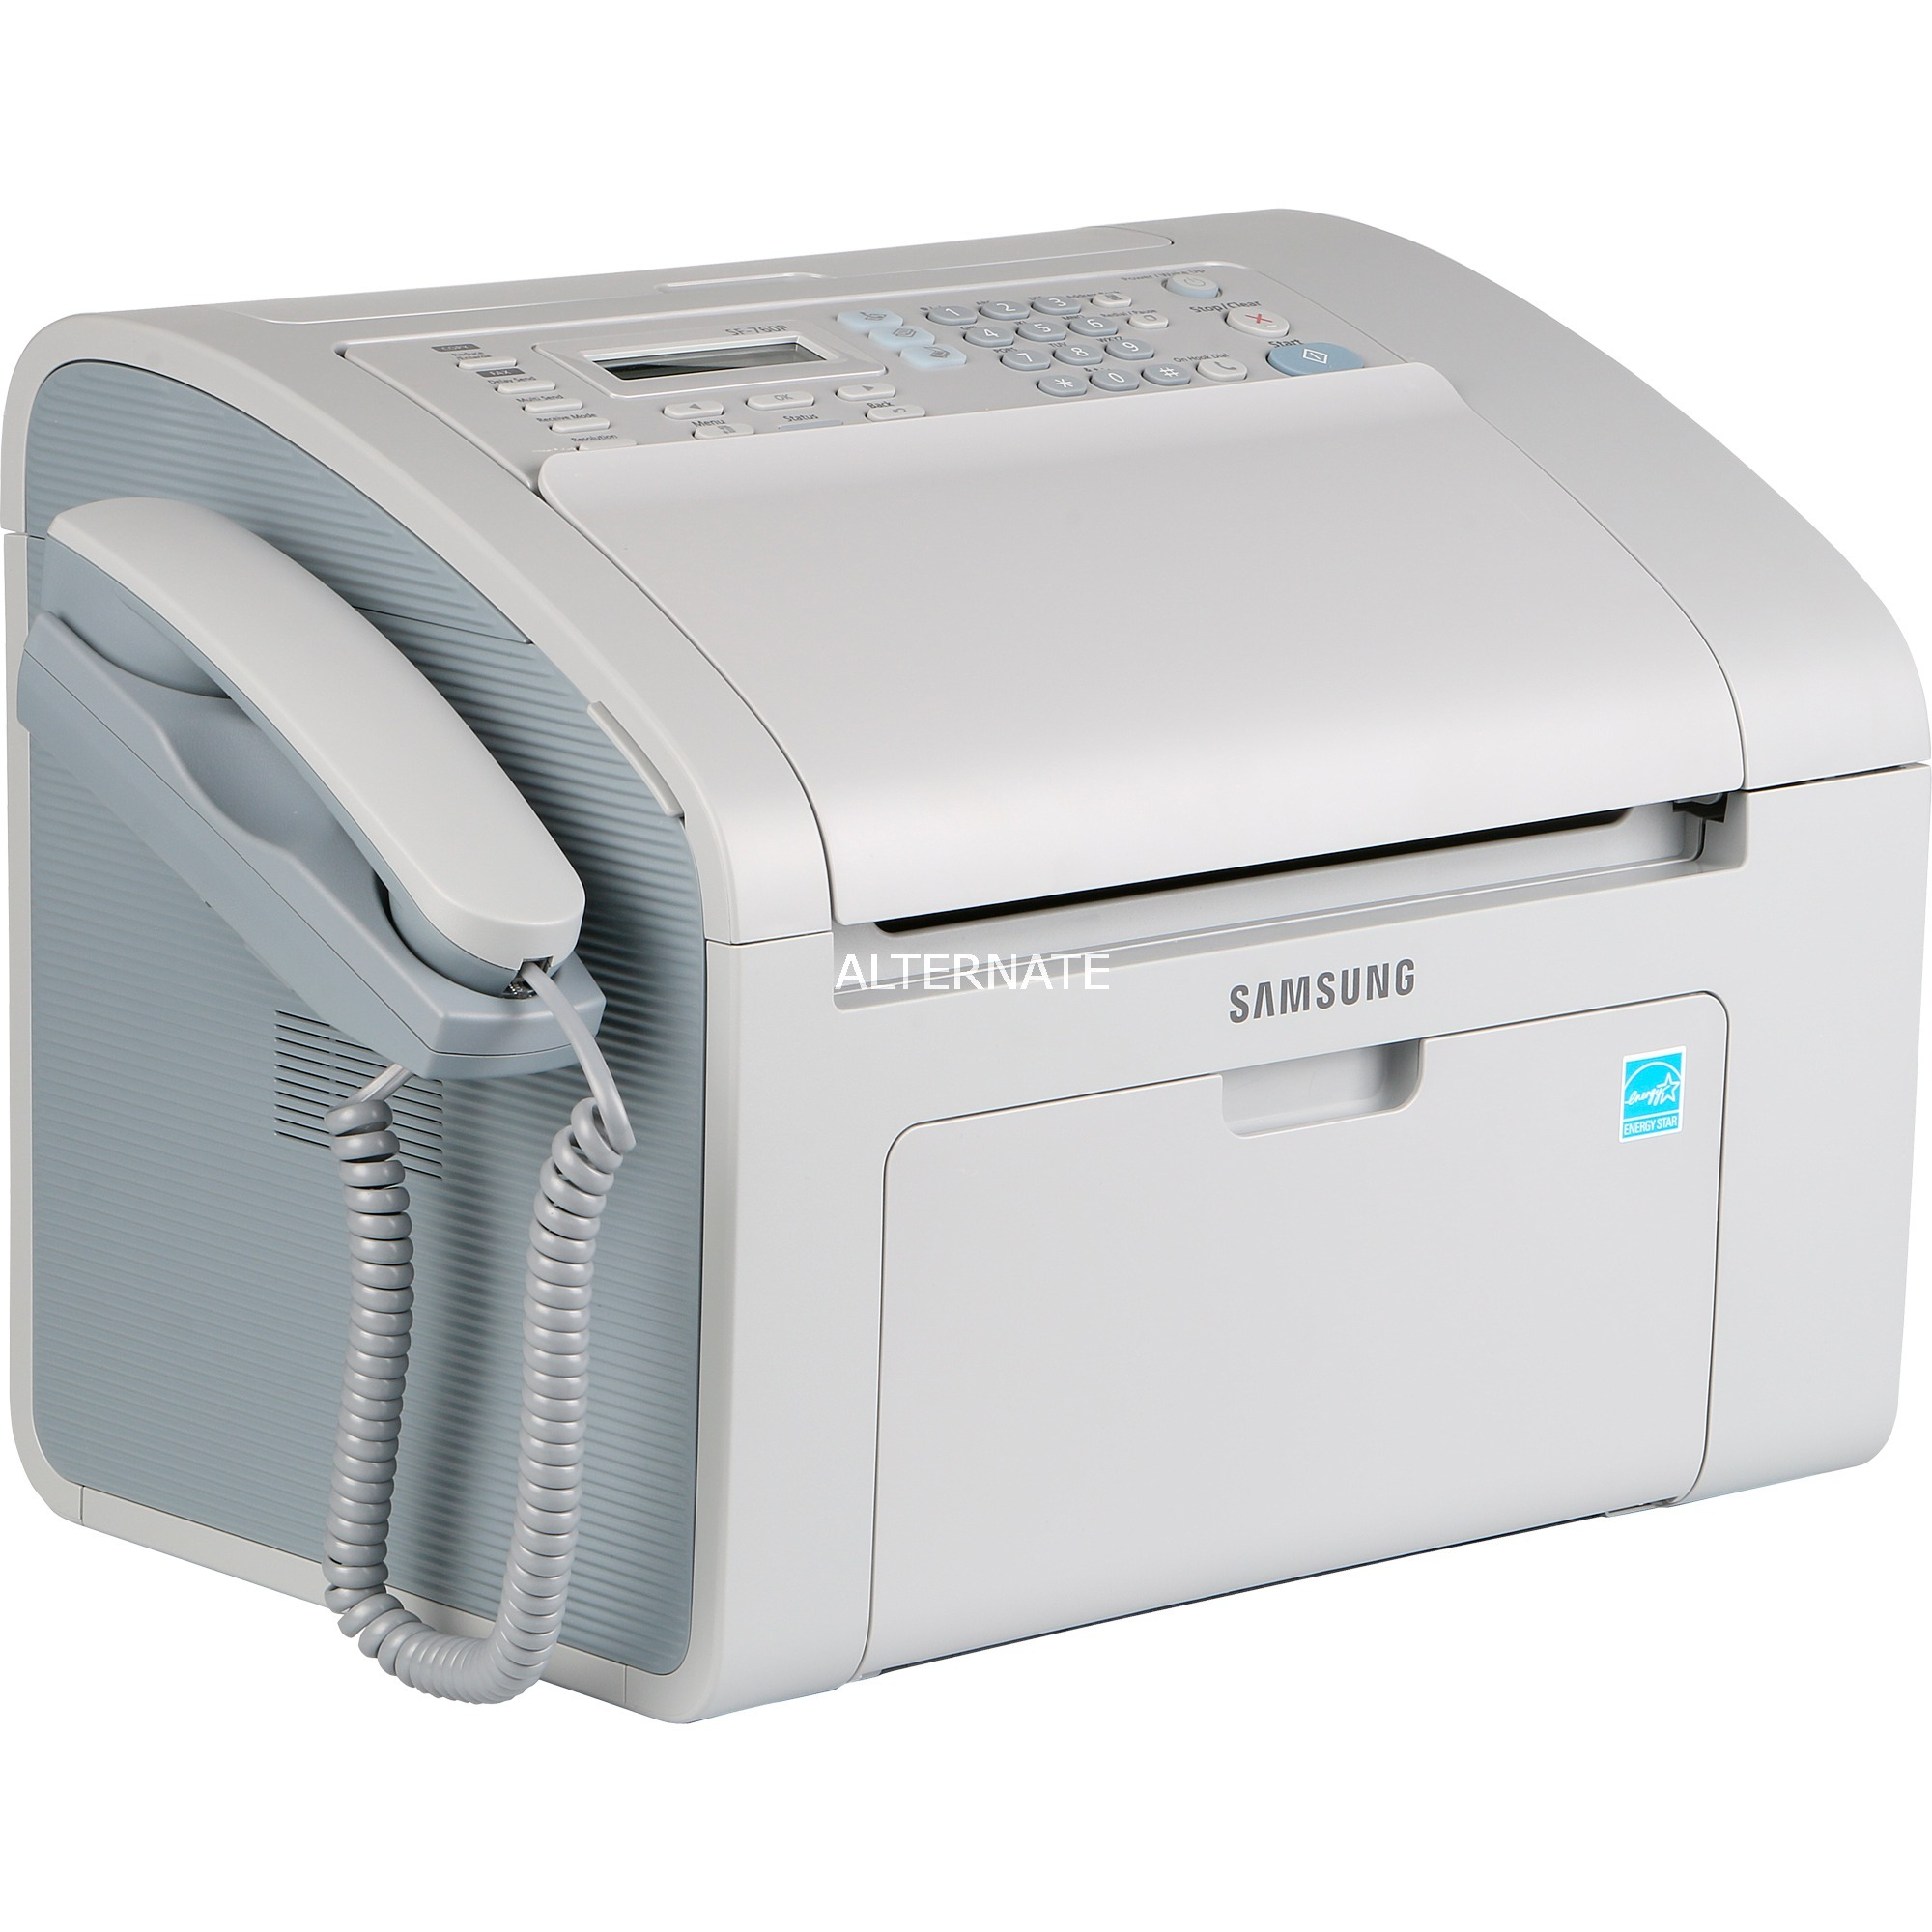 Imprimante multifonction Laser Samsung SF-760P, Fax machine